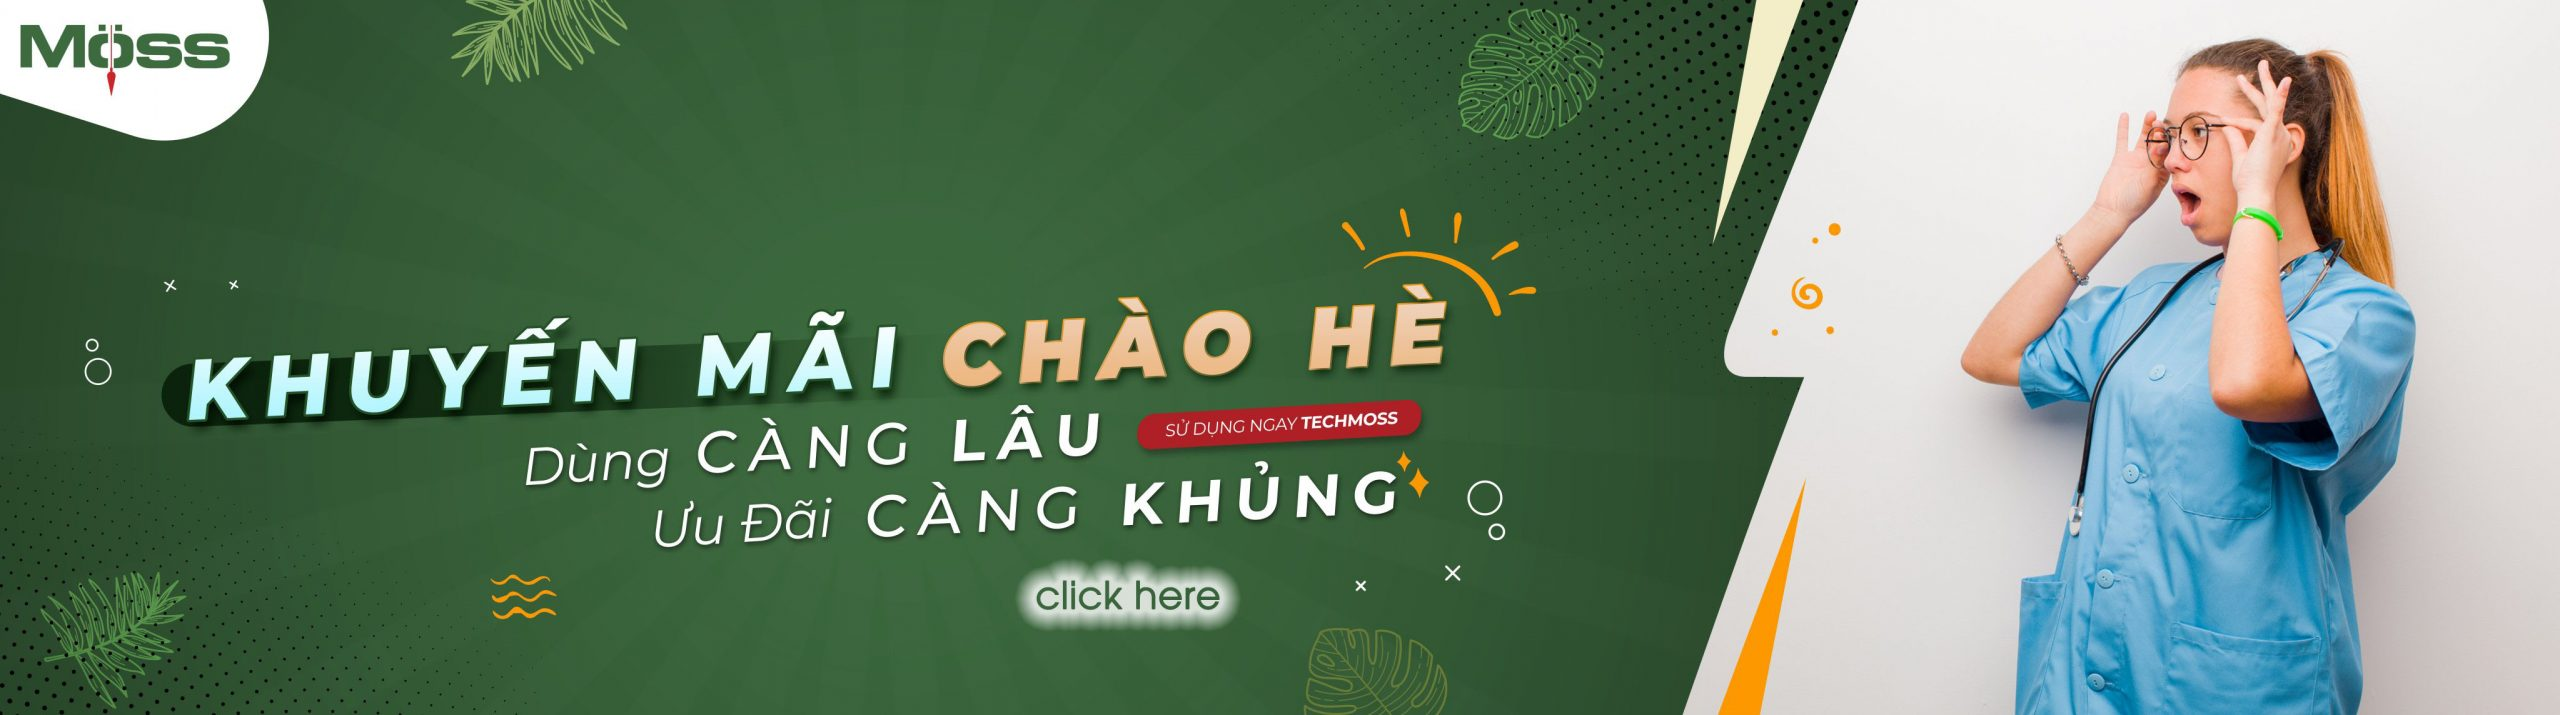 banner-khuyen-mai-mua-he-tech-moss-scaled